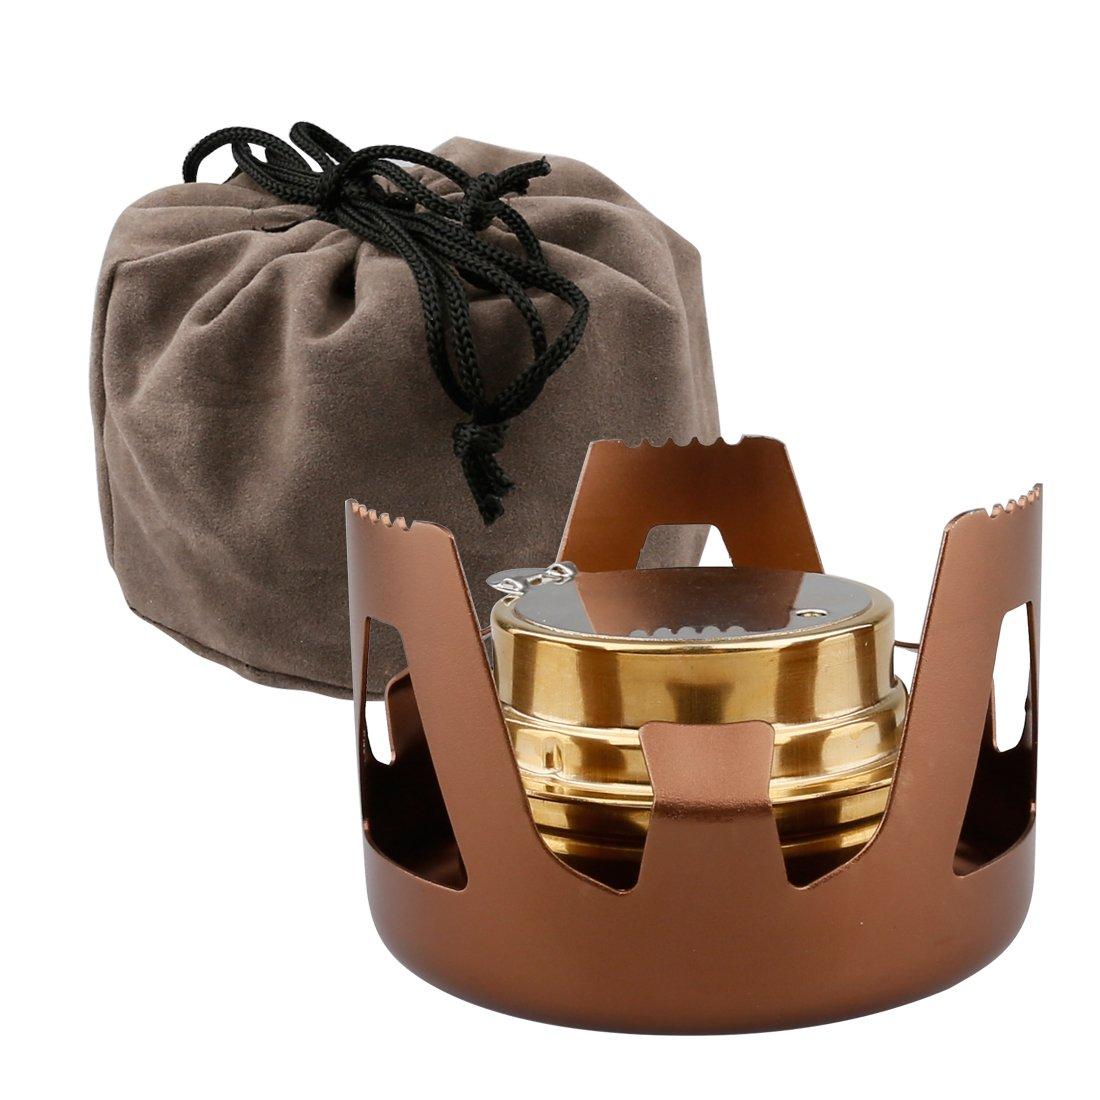 A-szcxtop Minihornillo de alcohol portátil en latón y aleación de aluminio para camping al aire libre, senderismo, mochileros, picnic, café: Amazon.es: ...